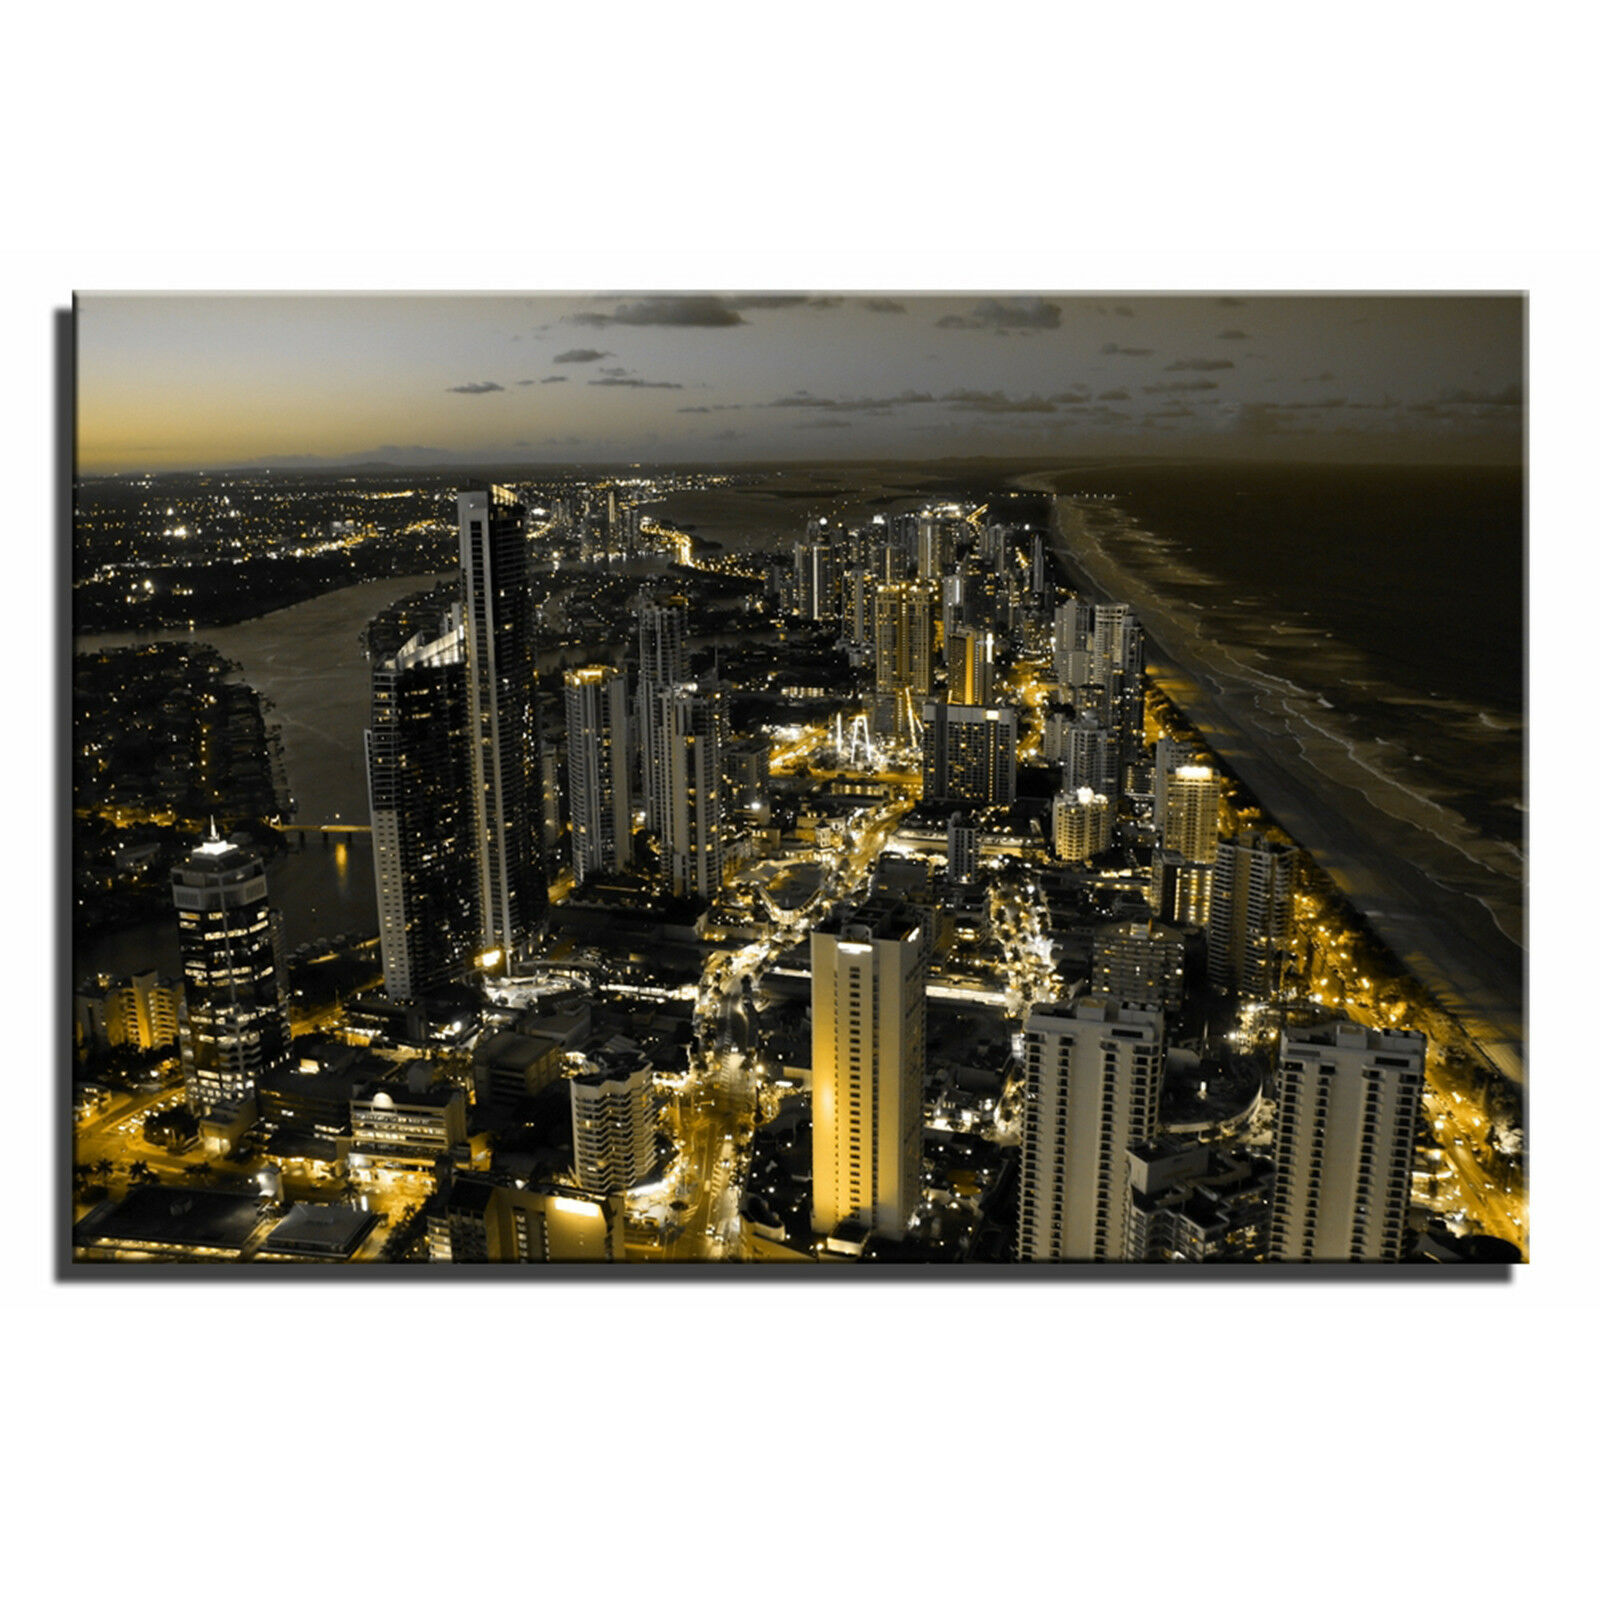 Australia Australia Australia Single Canvas Wall Art Picture Print 211 8a00ae